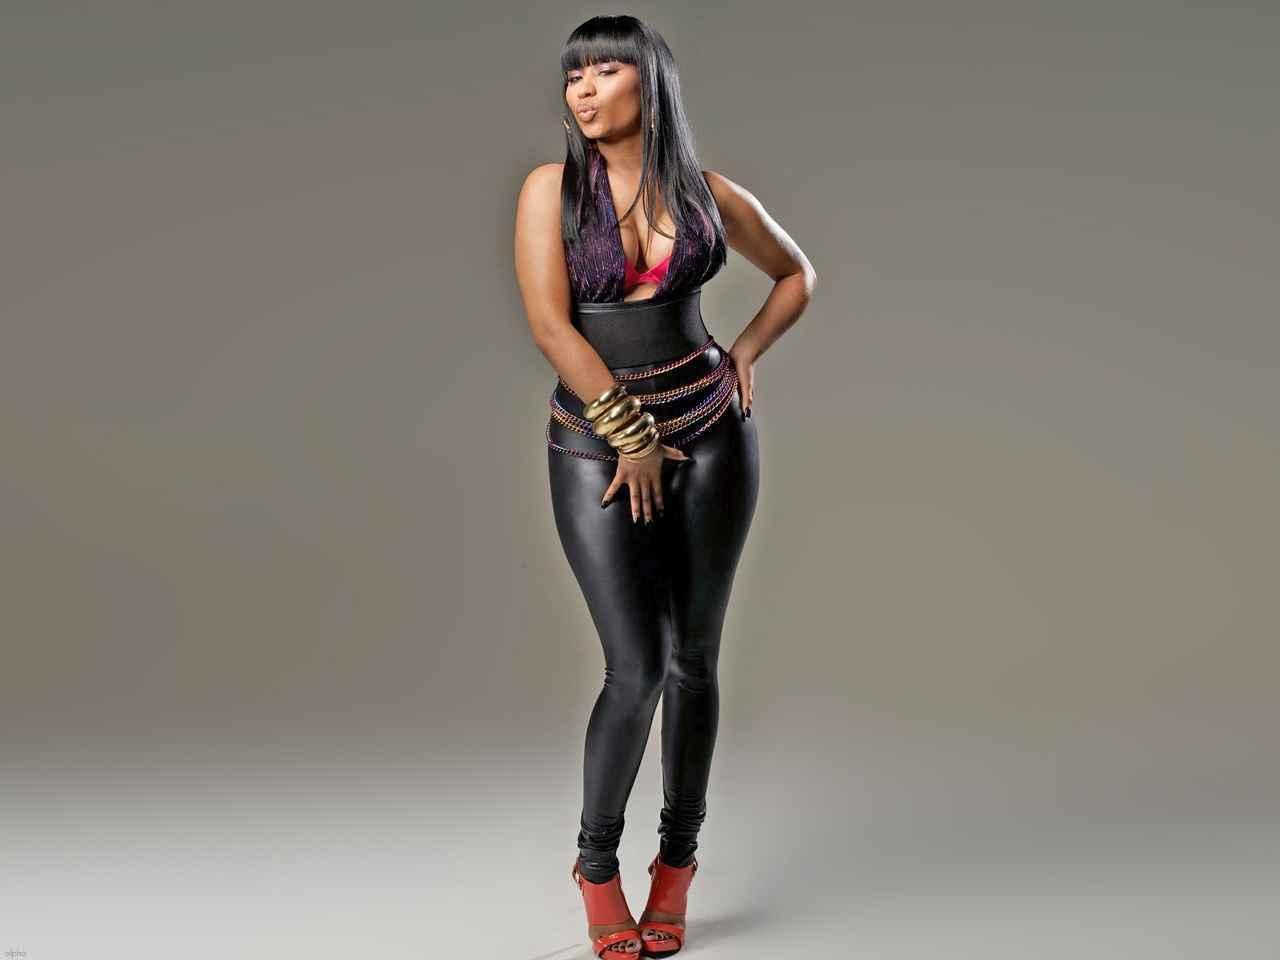 Nicki Minaj Wallpapers | Highlight Wallpapers